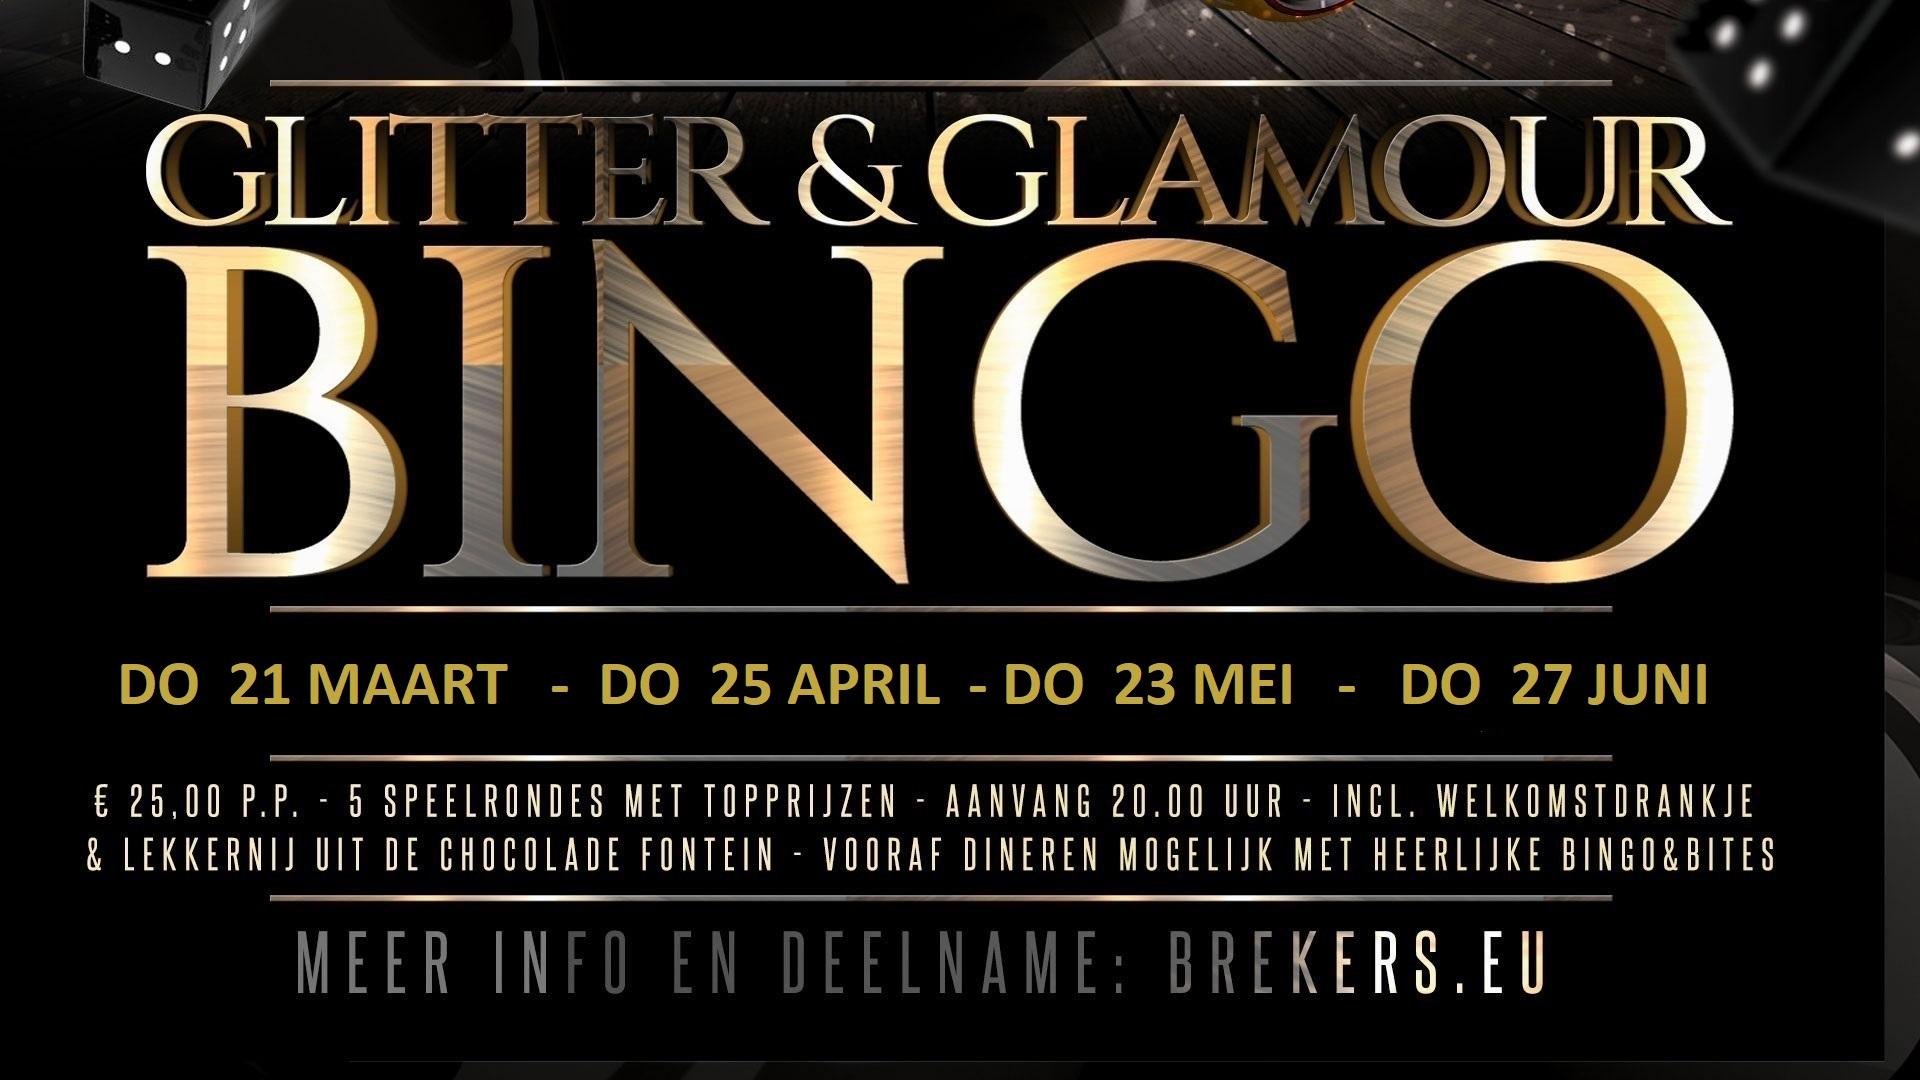 Glitter & Glamour Bingo 25 april